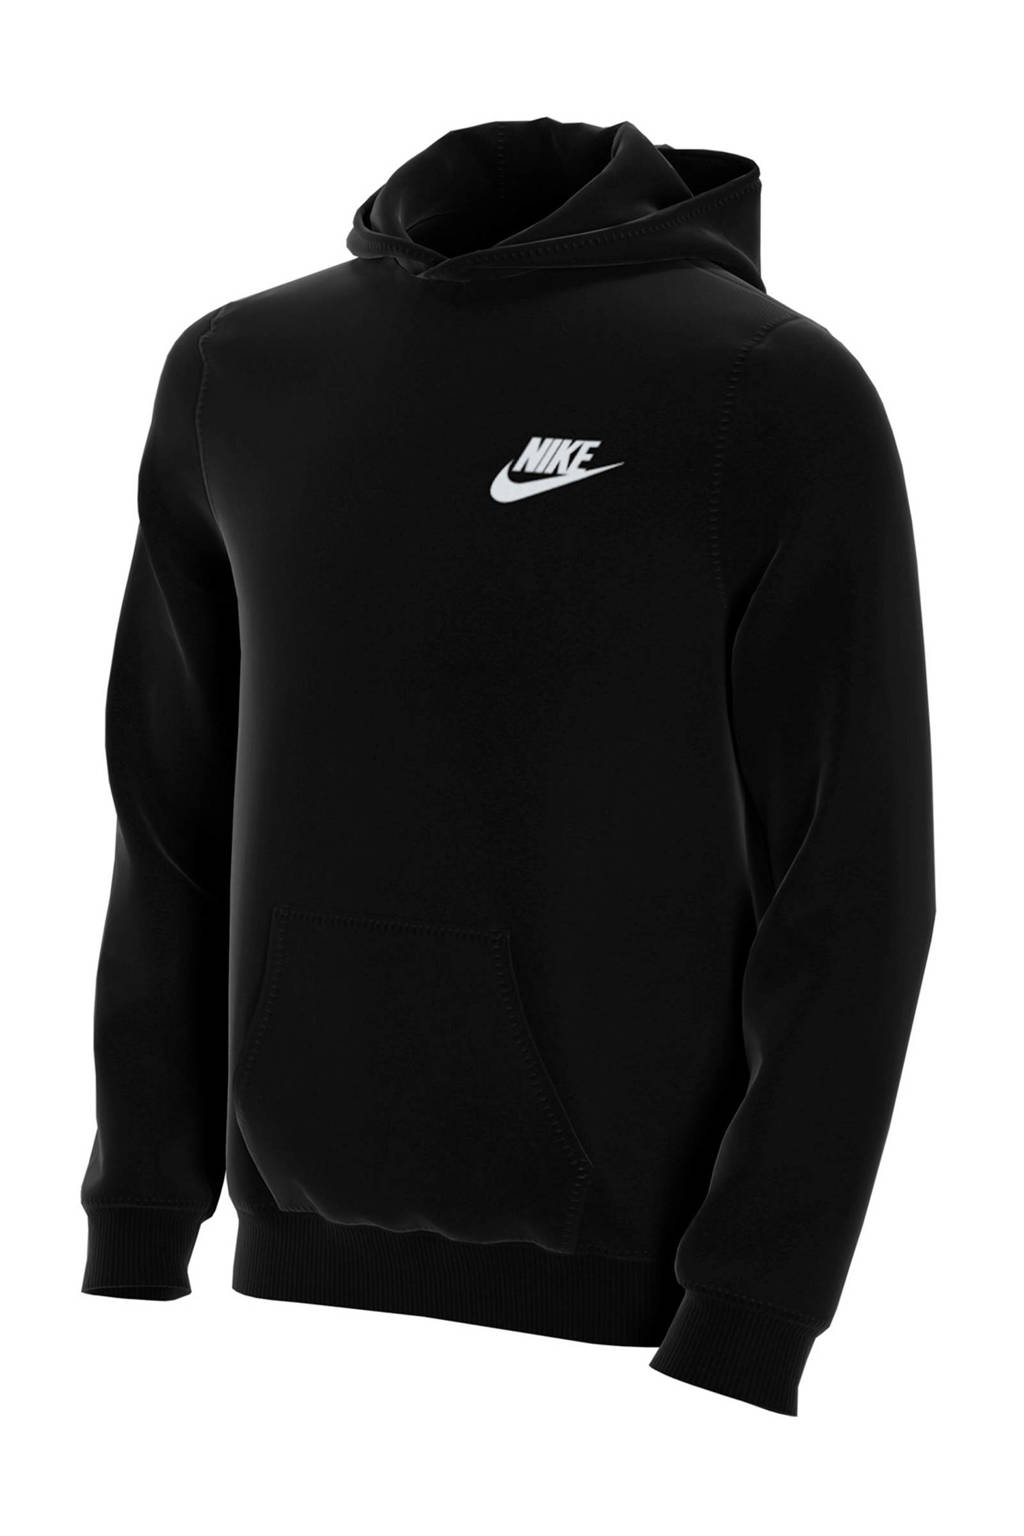 Nike hoodie zwart, Zwart/wit